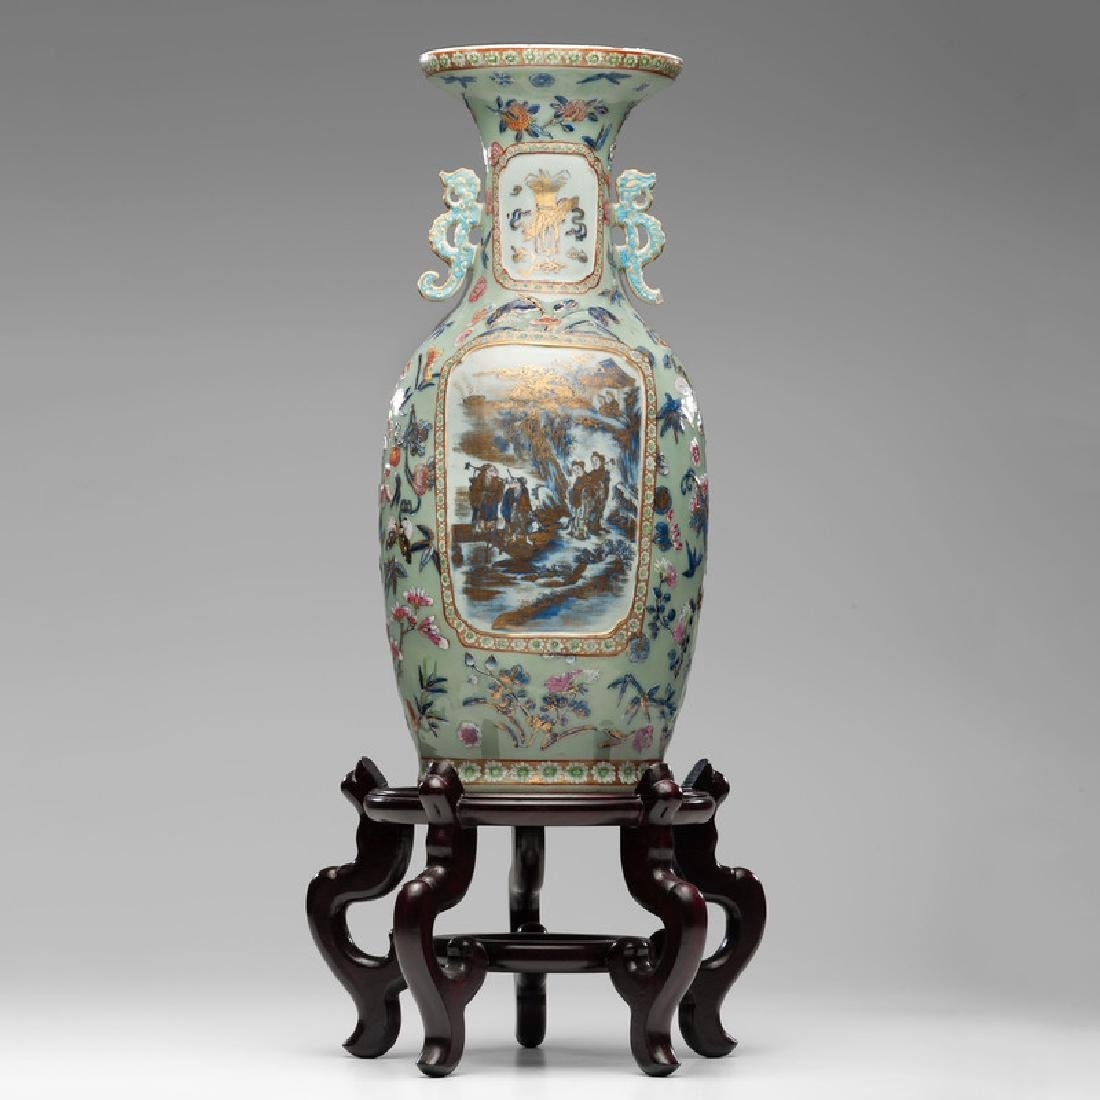 Chinese Polychrome Parcel-Gilt Vase